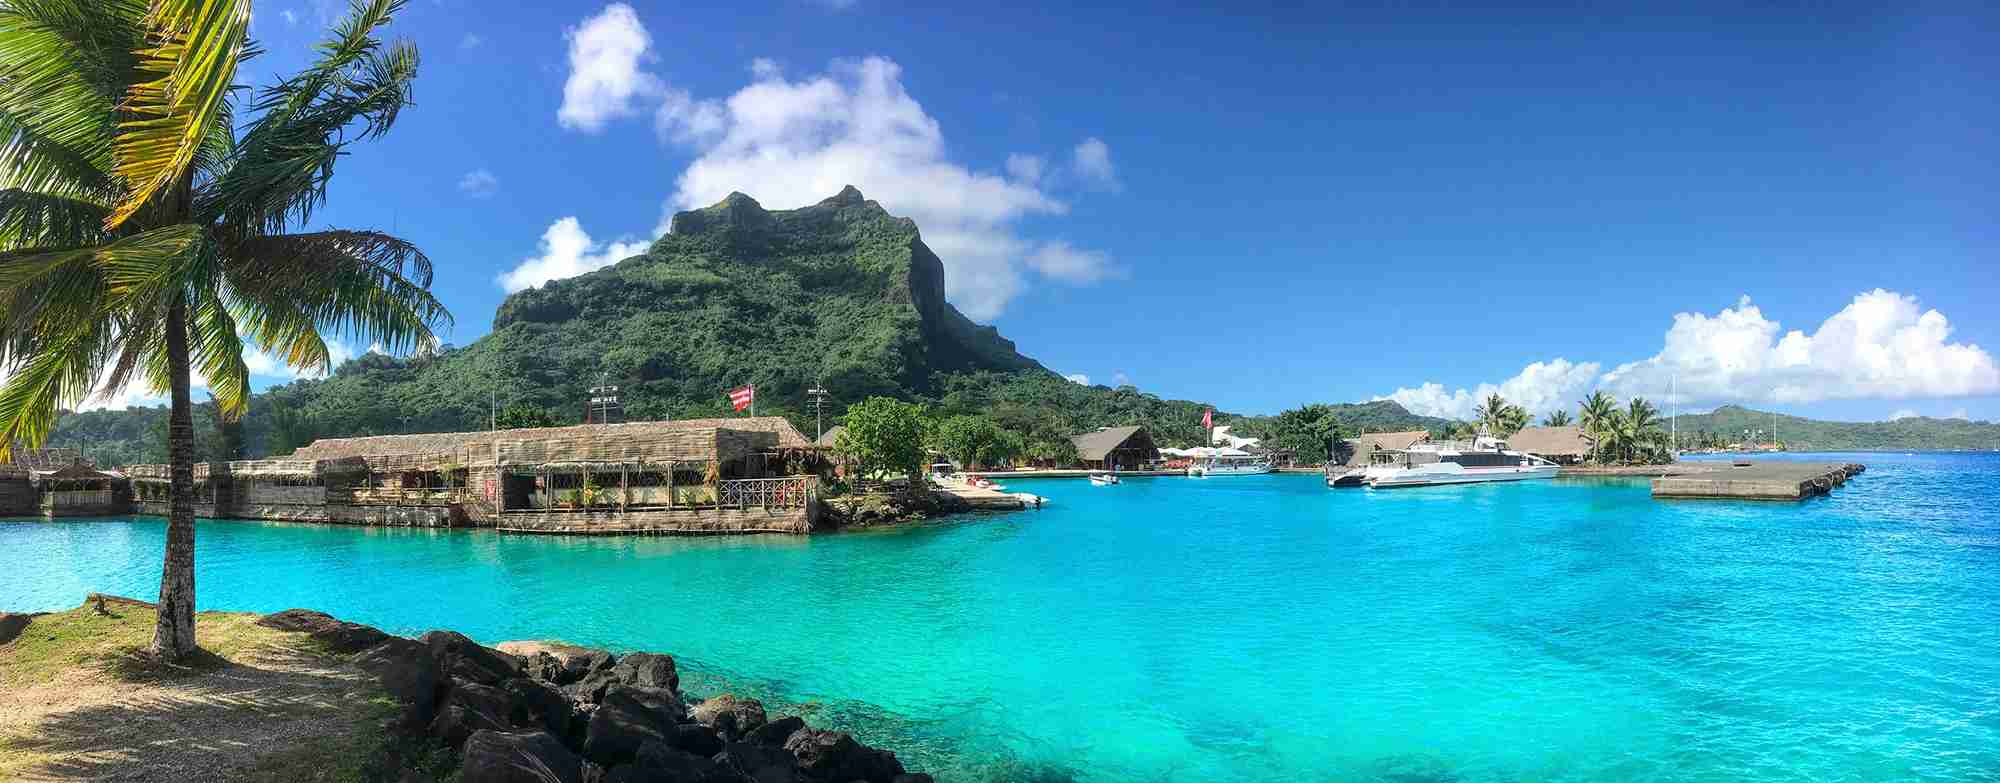 Bora Bora - Vaitape Harbor